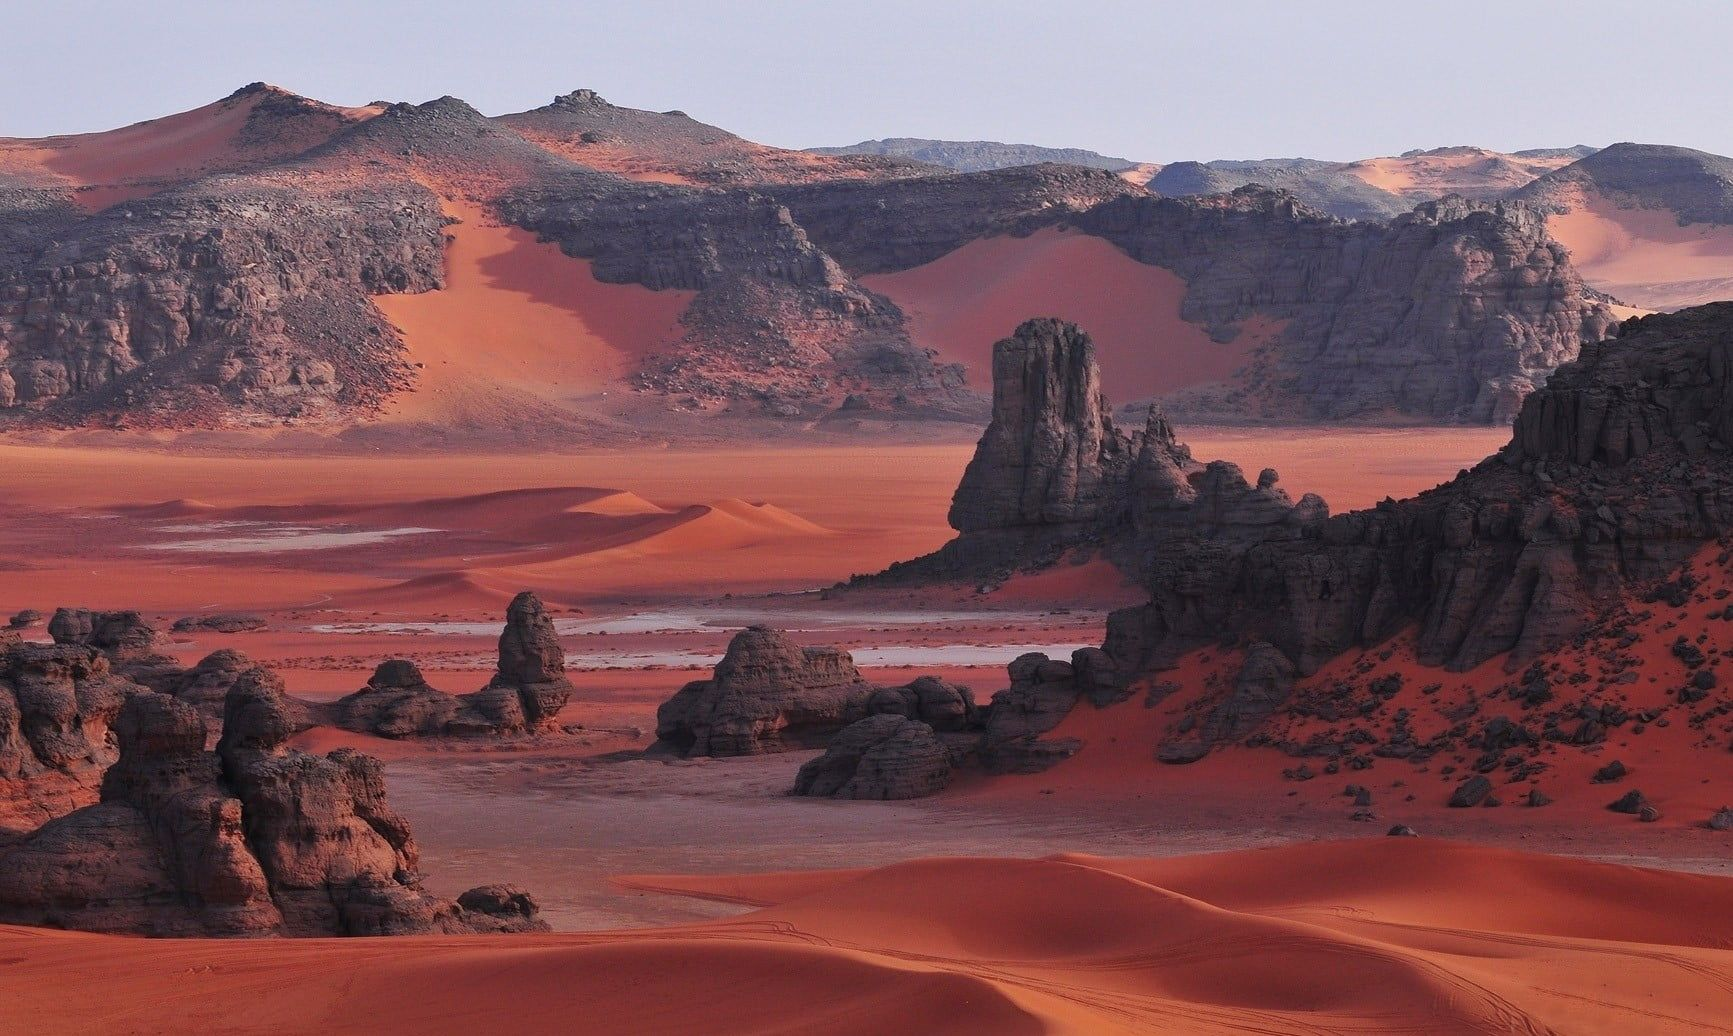 Grand Canyon Desert Sahara Algeria Dune Rock Mountains Red Nature Landscape 720p Wallpaper Hdwallpape National Parks Places To Visit Algeria Travel